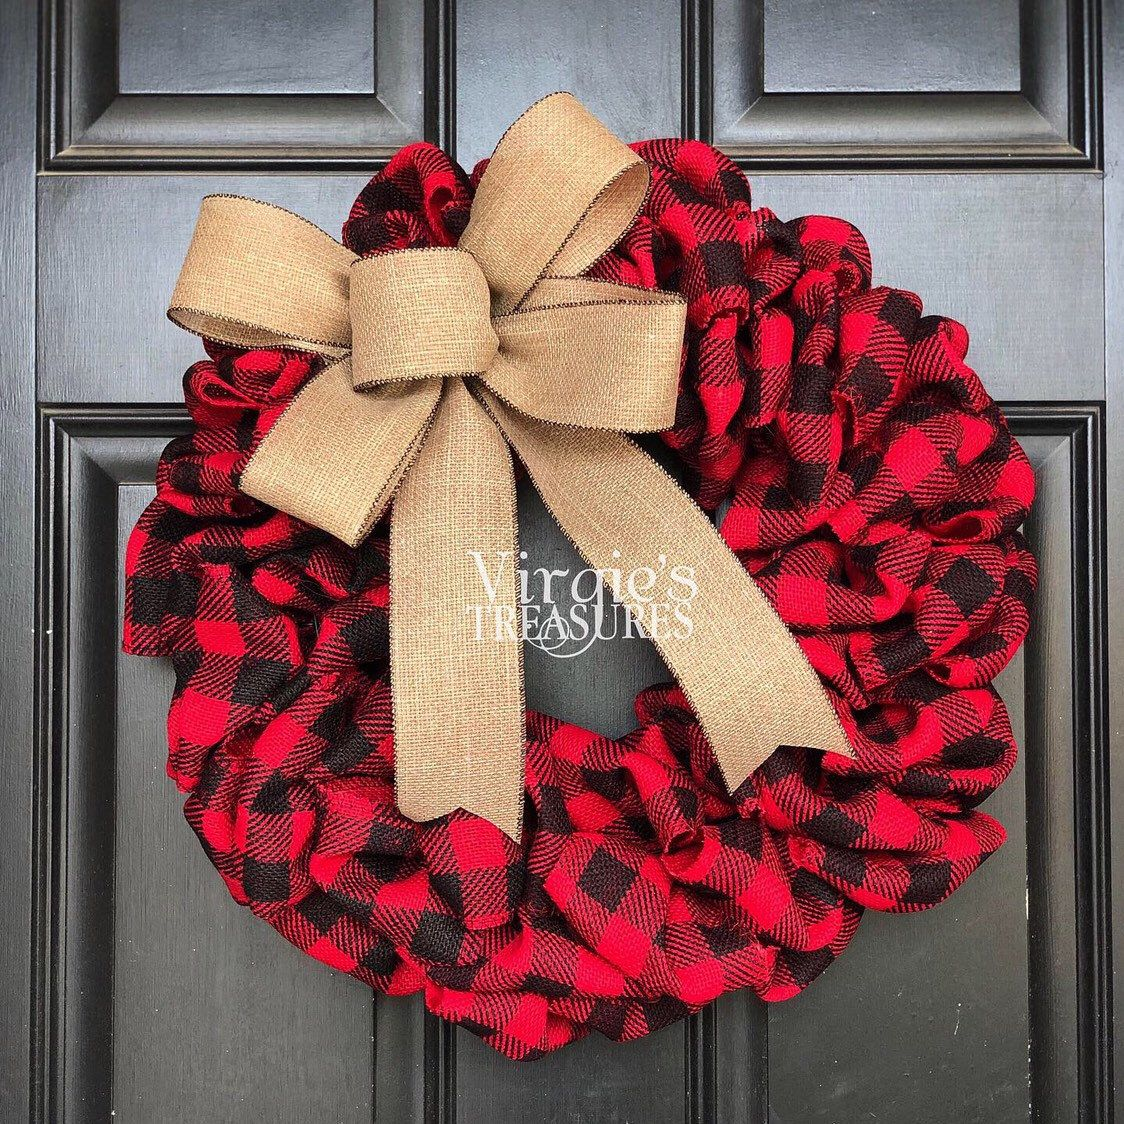 Photo of Buffalo Plaid Wreath, Front Door Wreath, Holiday Wreath, Red Black Buffalo Plaid Wreath, Farmhouse Christmas Wreath, Christmas Wreath